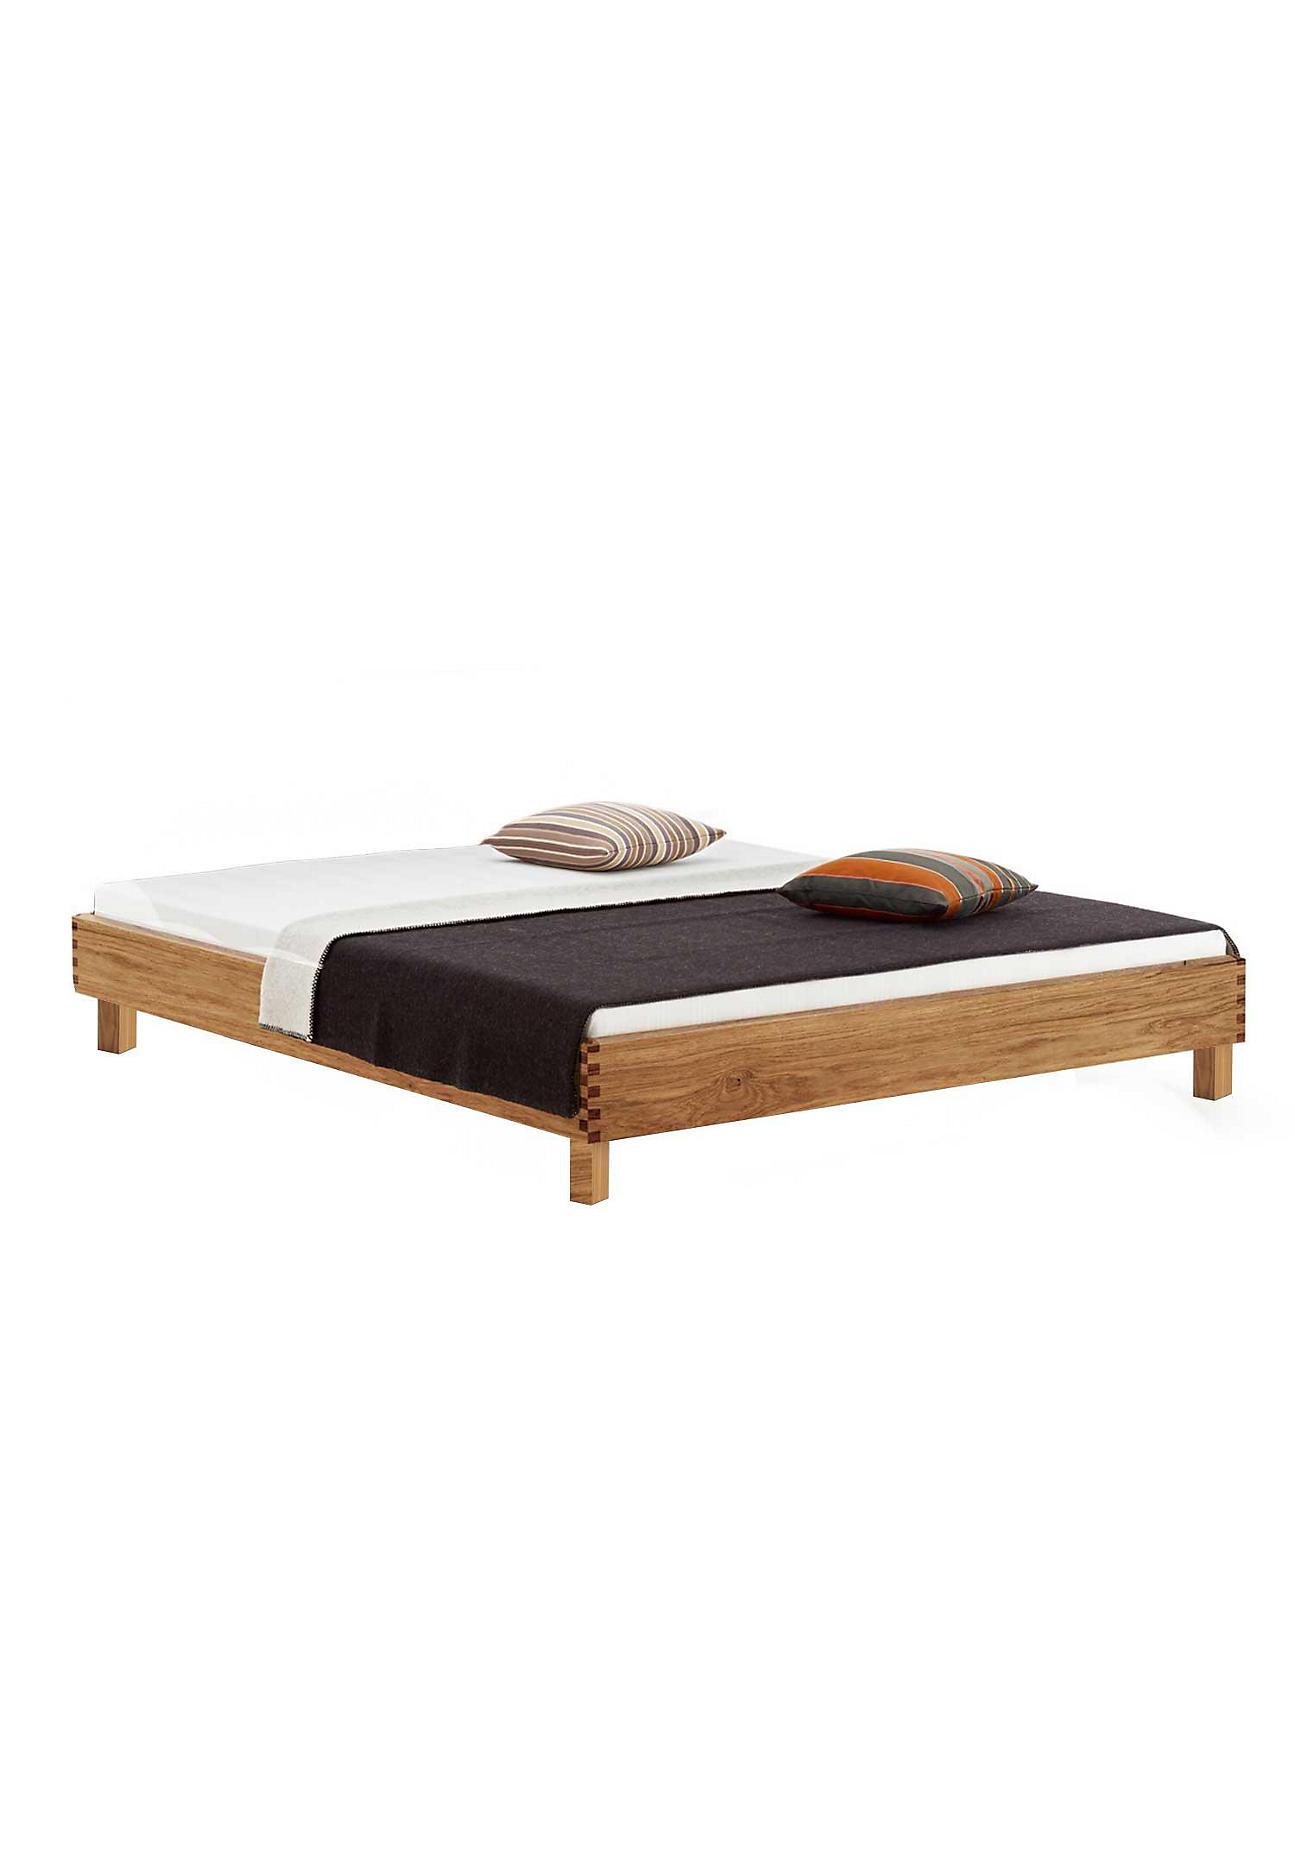 produktdetails f r bett step x mit holzbeinen. Black Bedroom Furniture Sets. Home Design Ideas